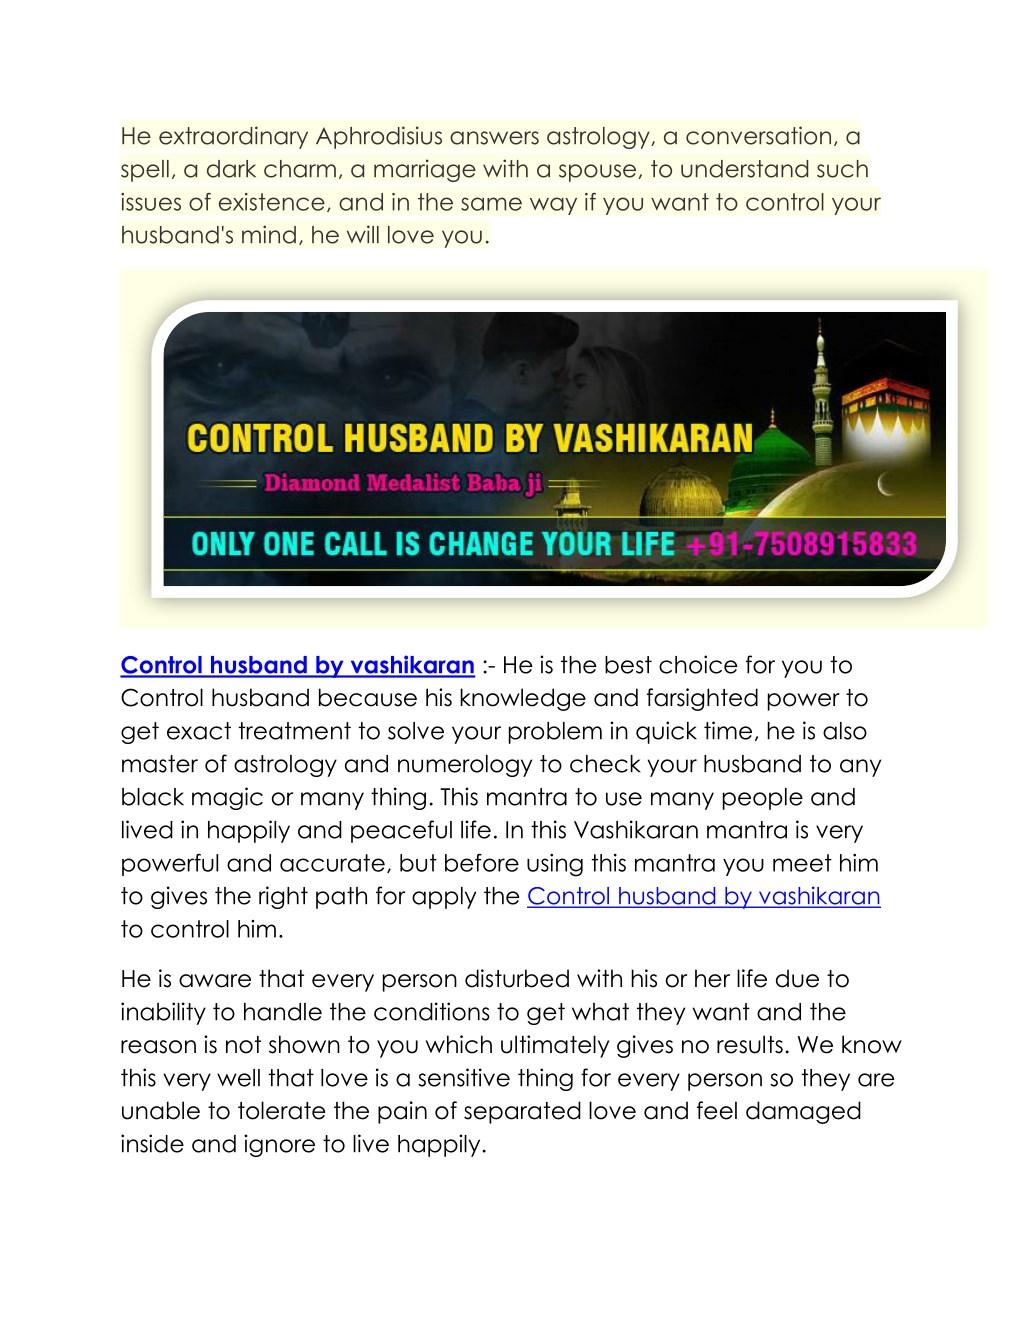 PPT - Control Husband By Vashikaran | 91-7508915833 | Delhi